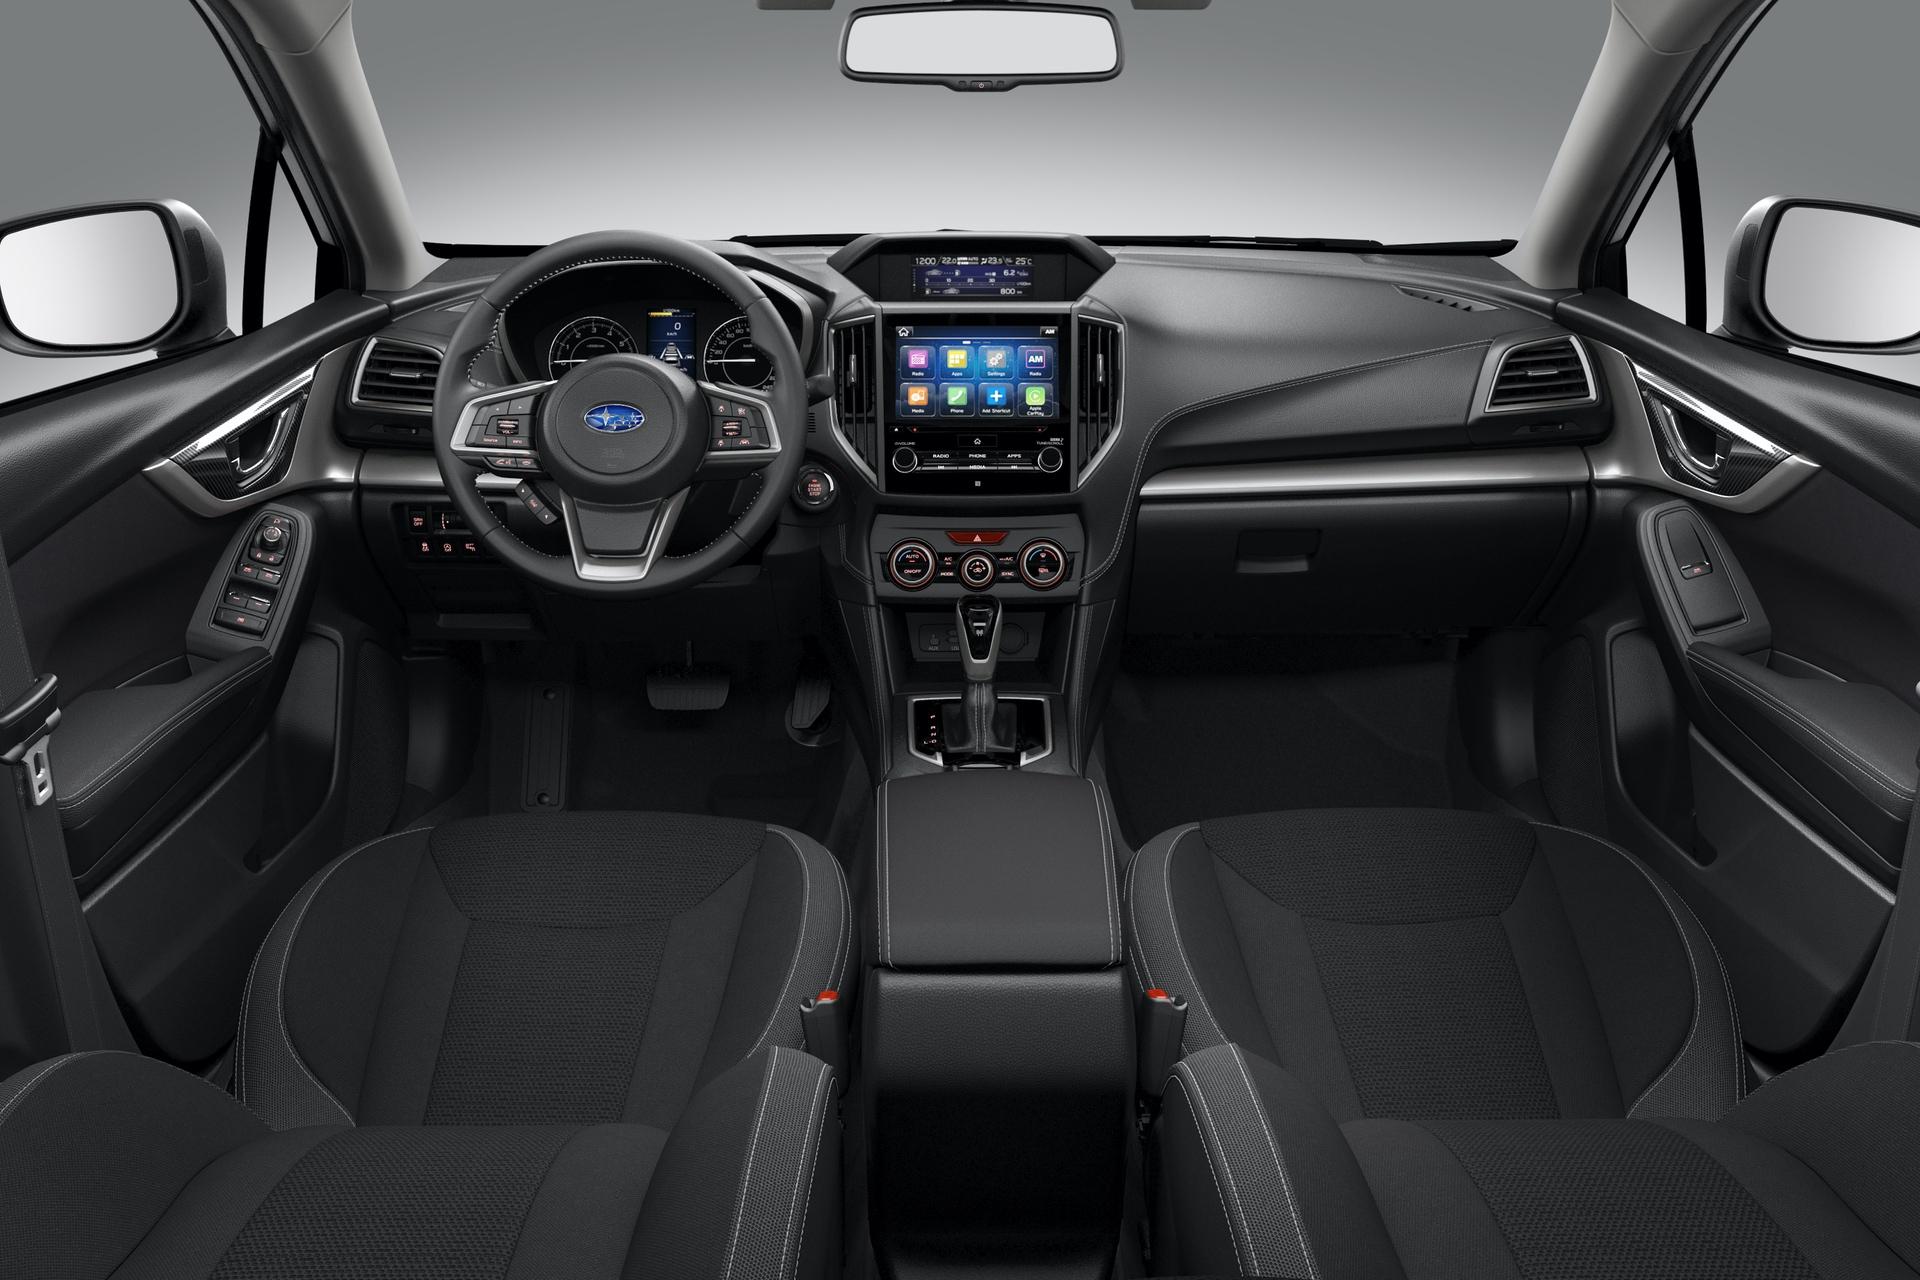 First_Drive_Subaru_Impreza_0012